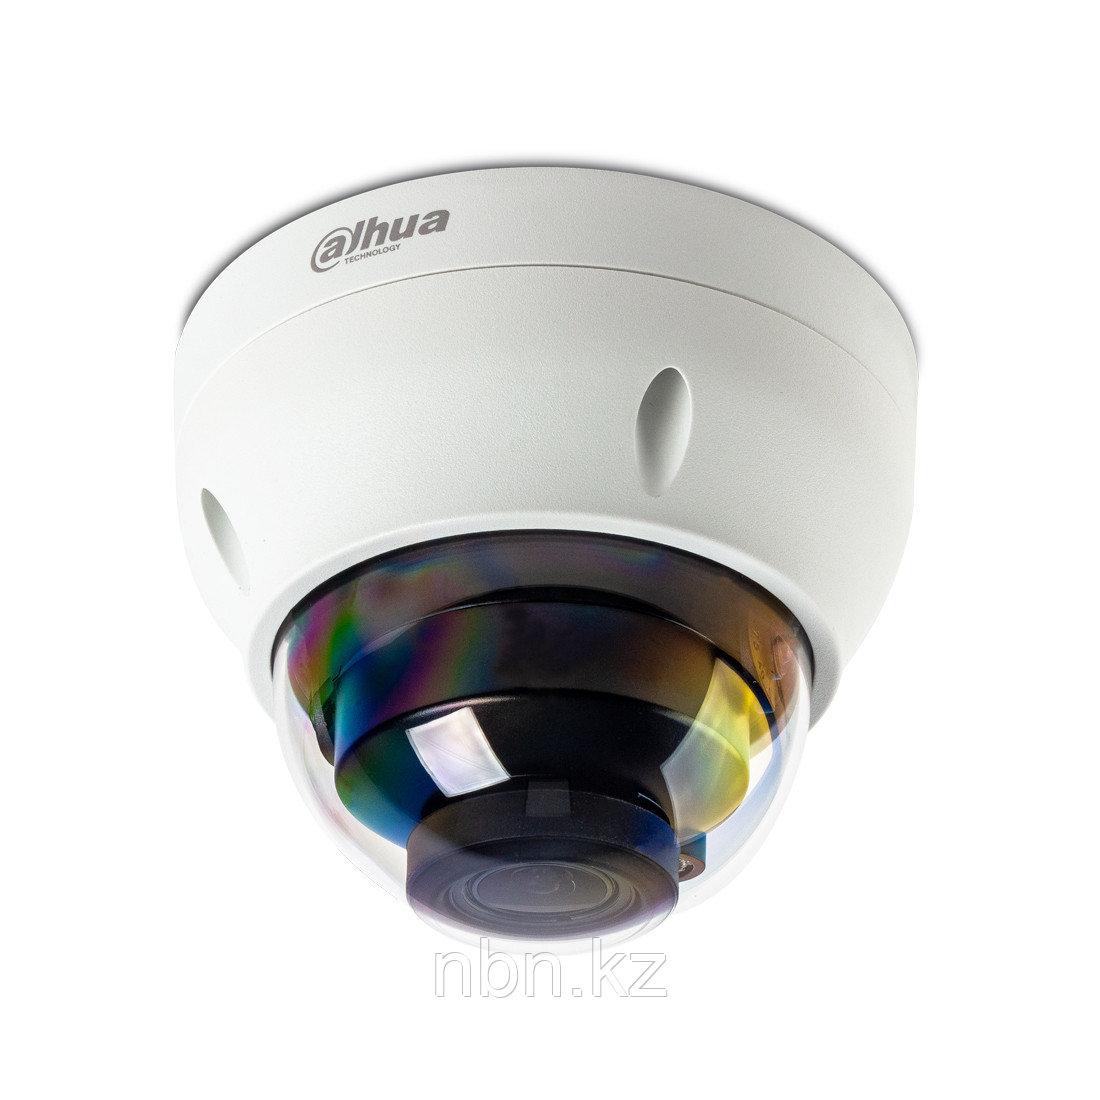 Купольная видеокамера Dahua DH-IPC-HDPW1210RP-ZS-2812